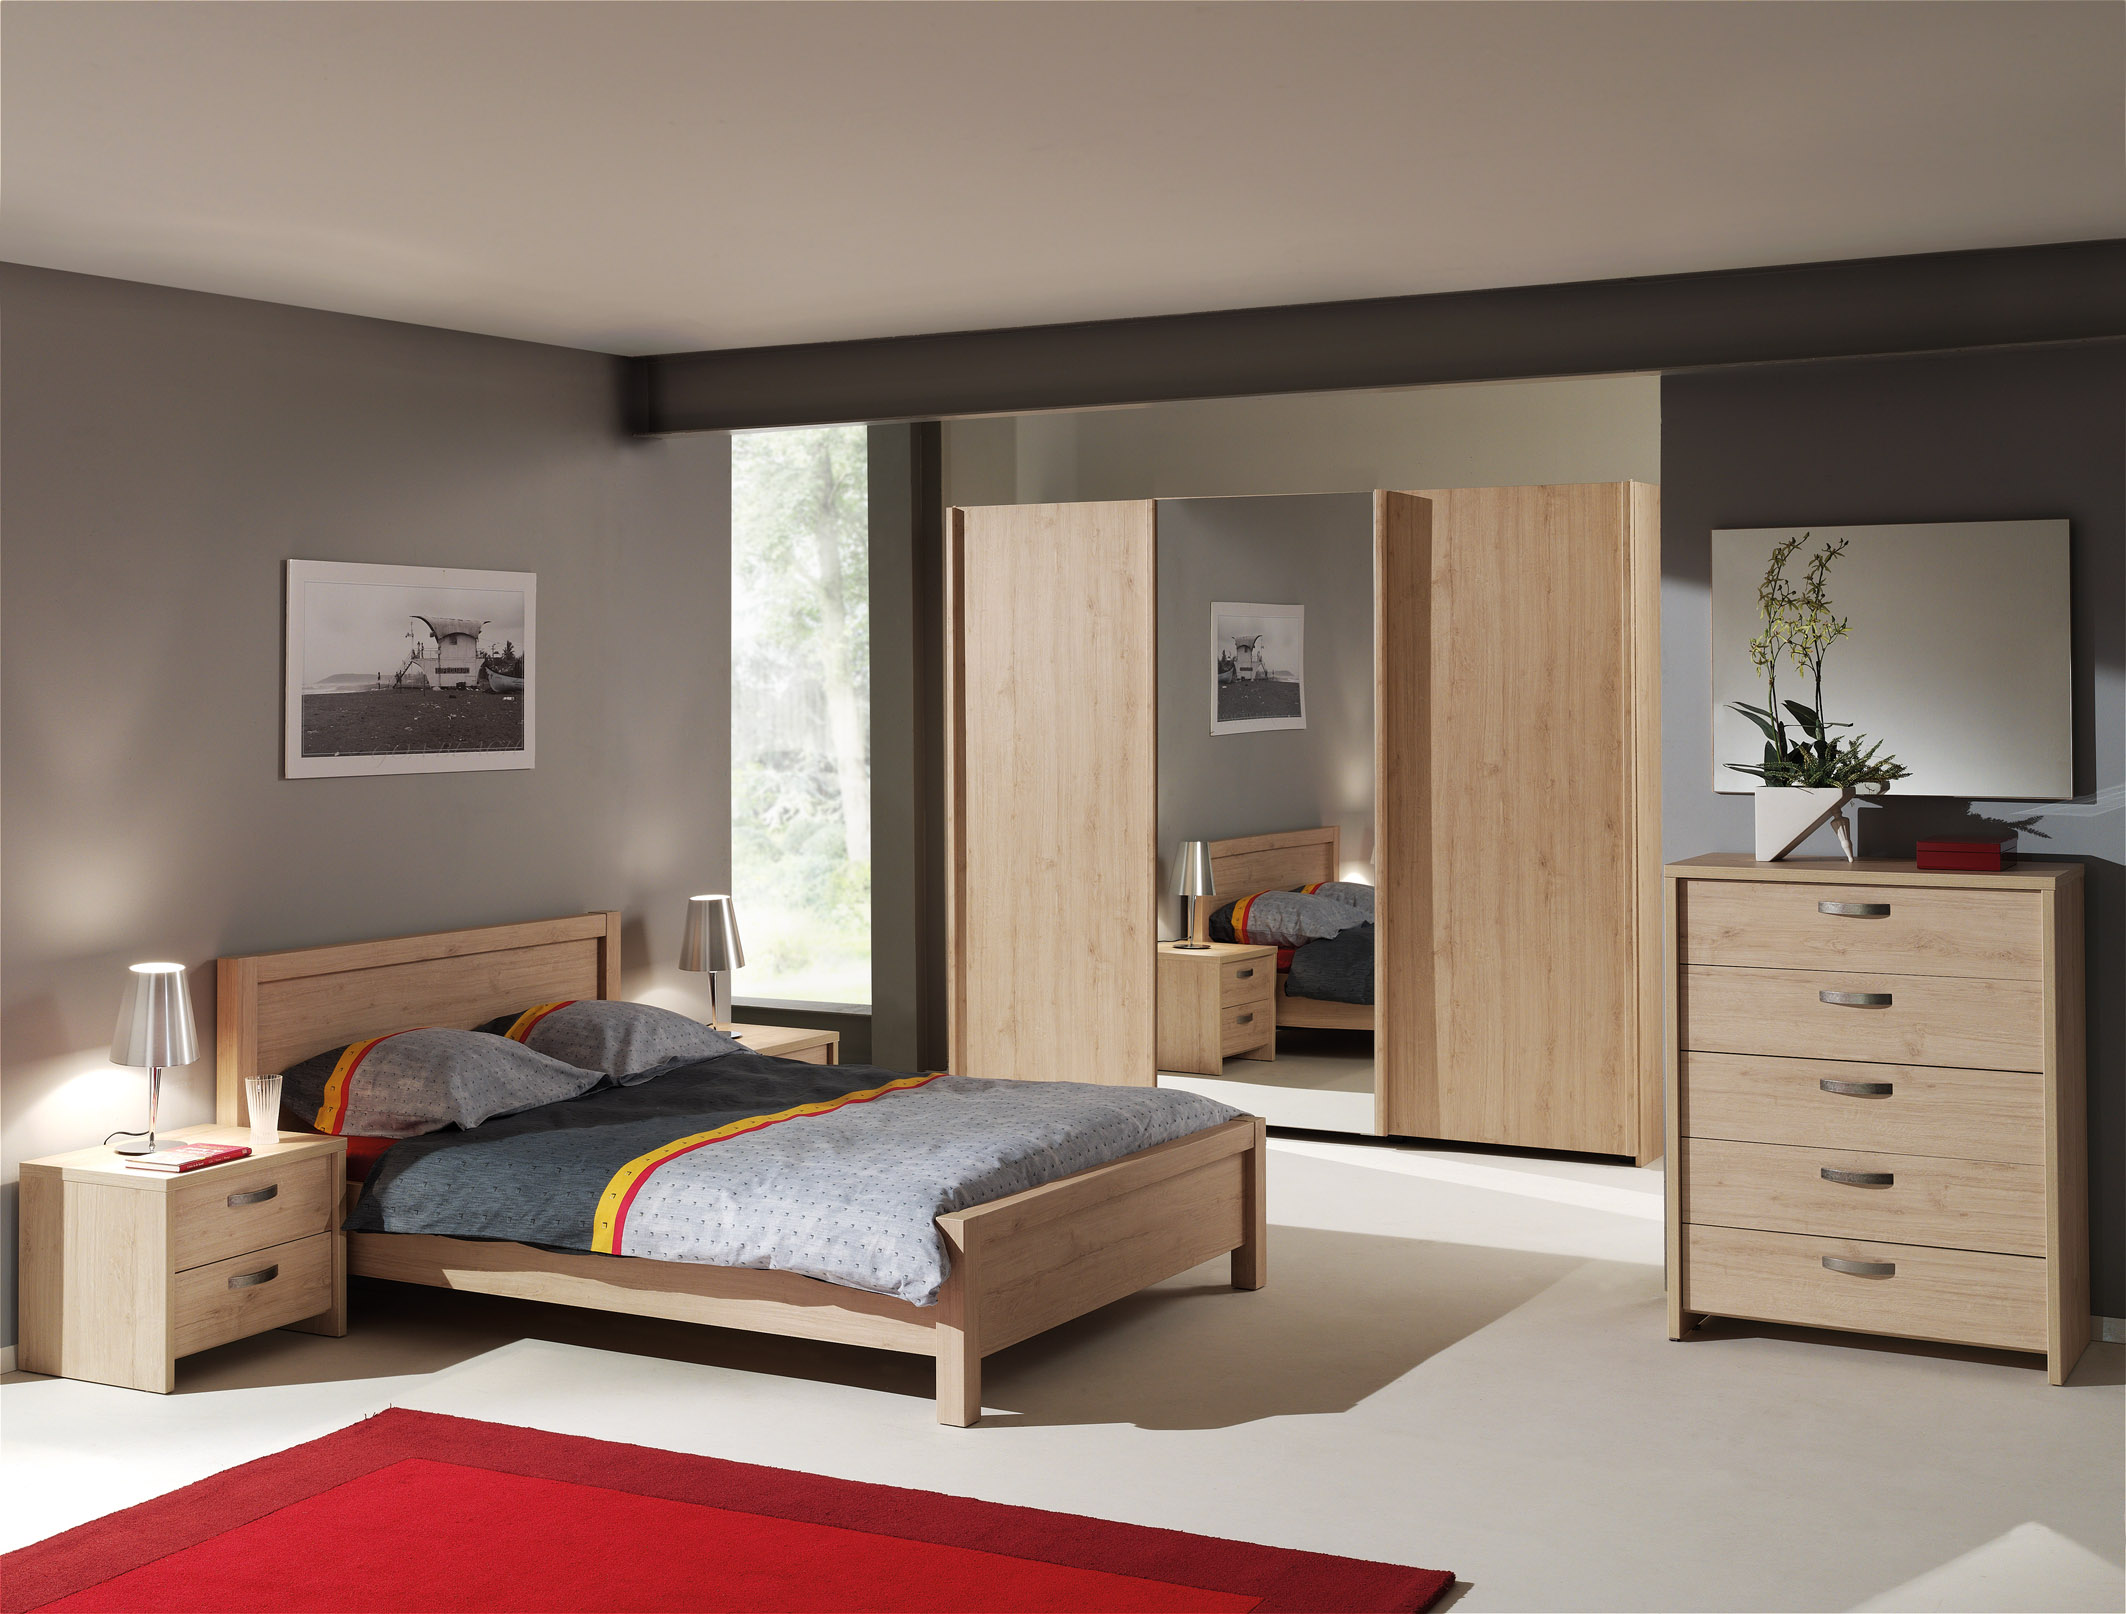 slaapkamers  productcategorieën  meubelen tilt de keizer, Meubels Ideeën